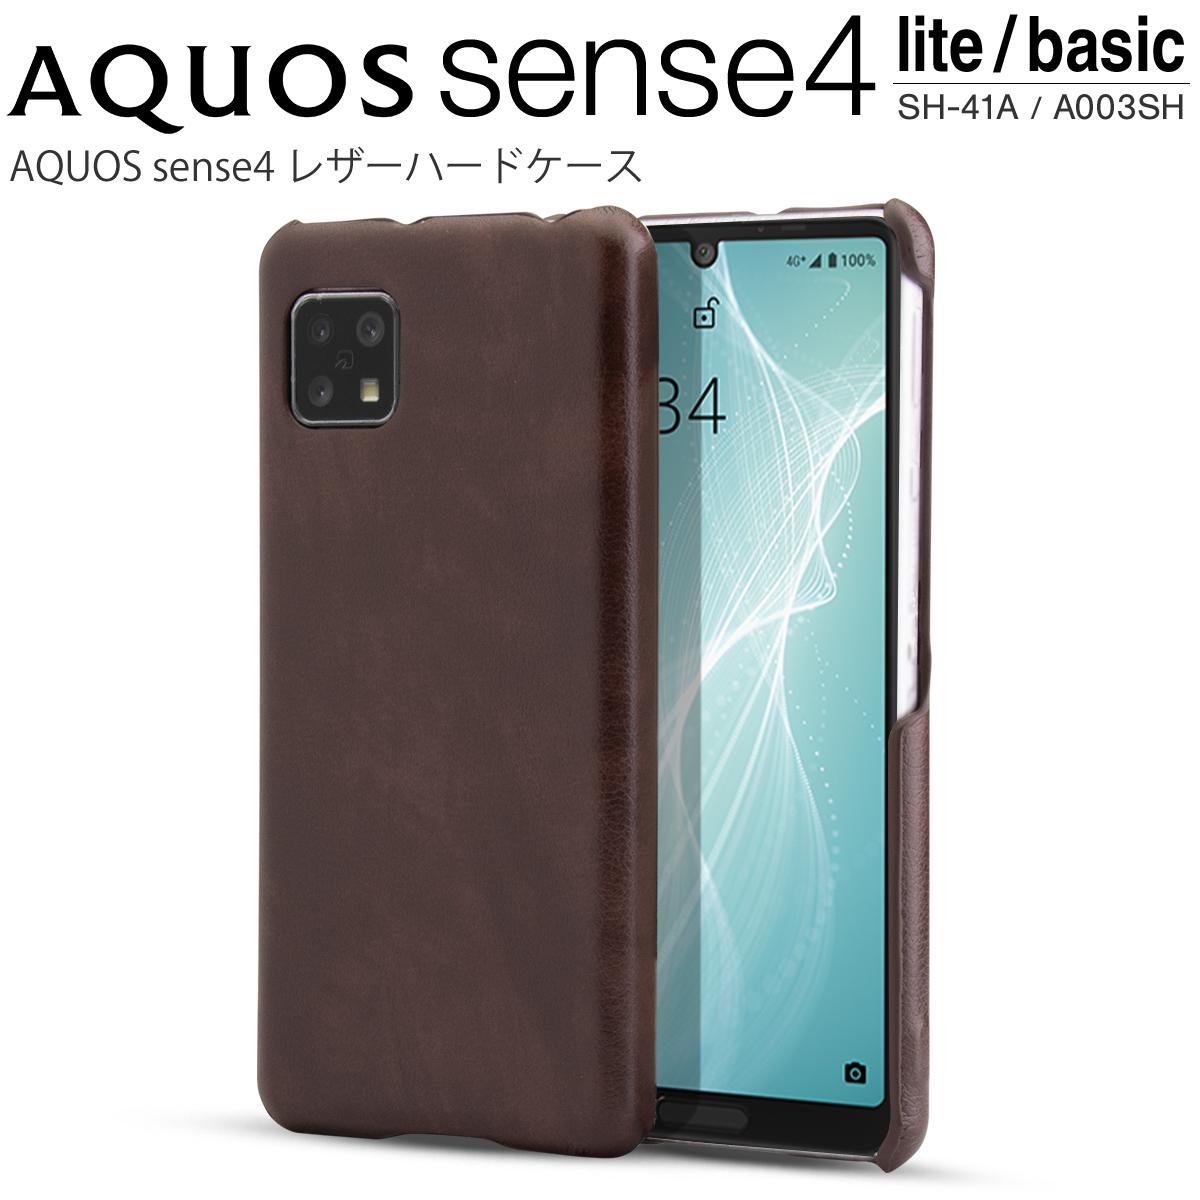 AQUOS sense4 SH-41A AQUOS sense4 basic A003SH AQUOS sense4 lite レザーハードケース